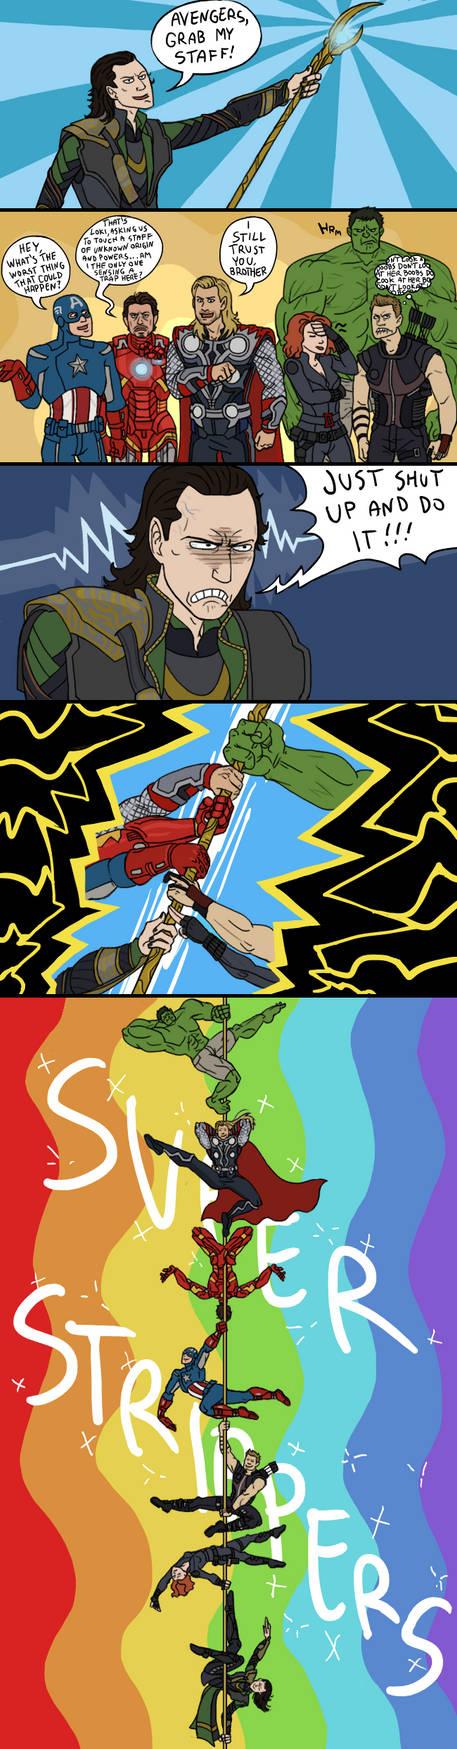 Avengers: Strippers Assemble